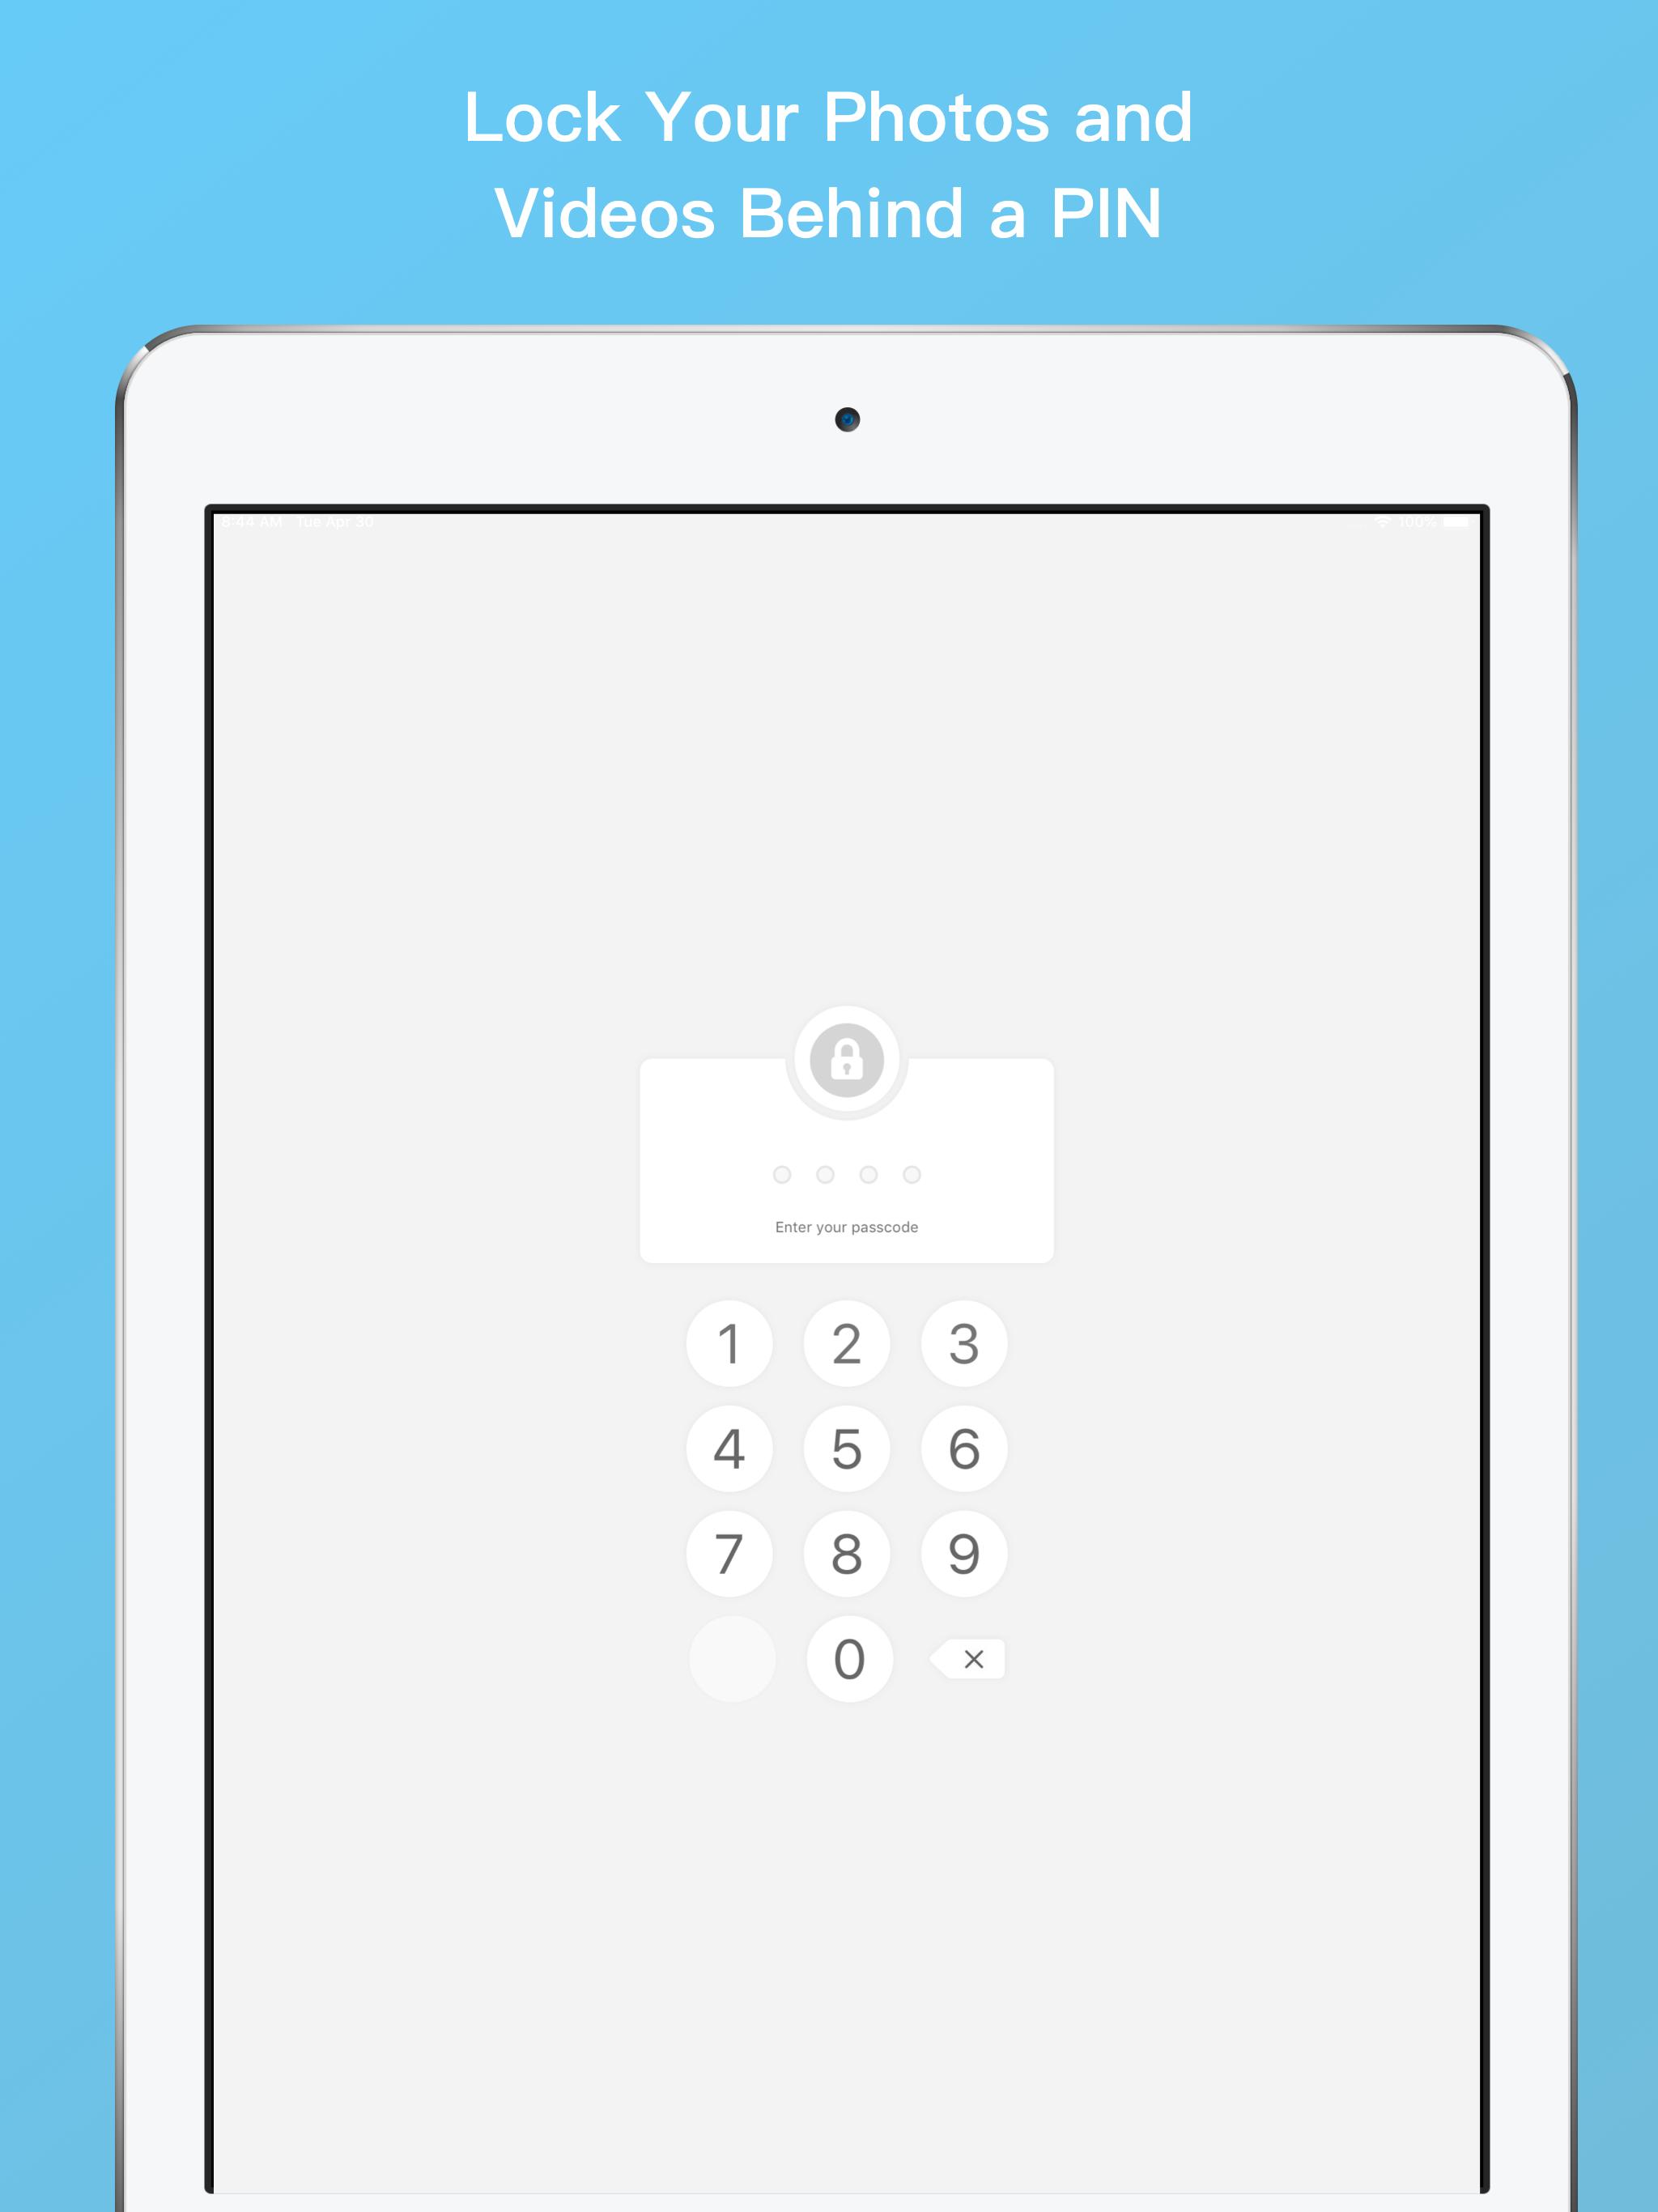 ipad-pro2-device-1